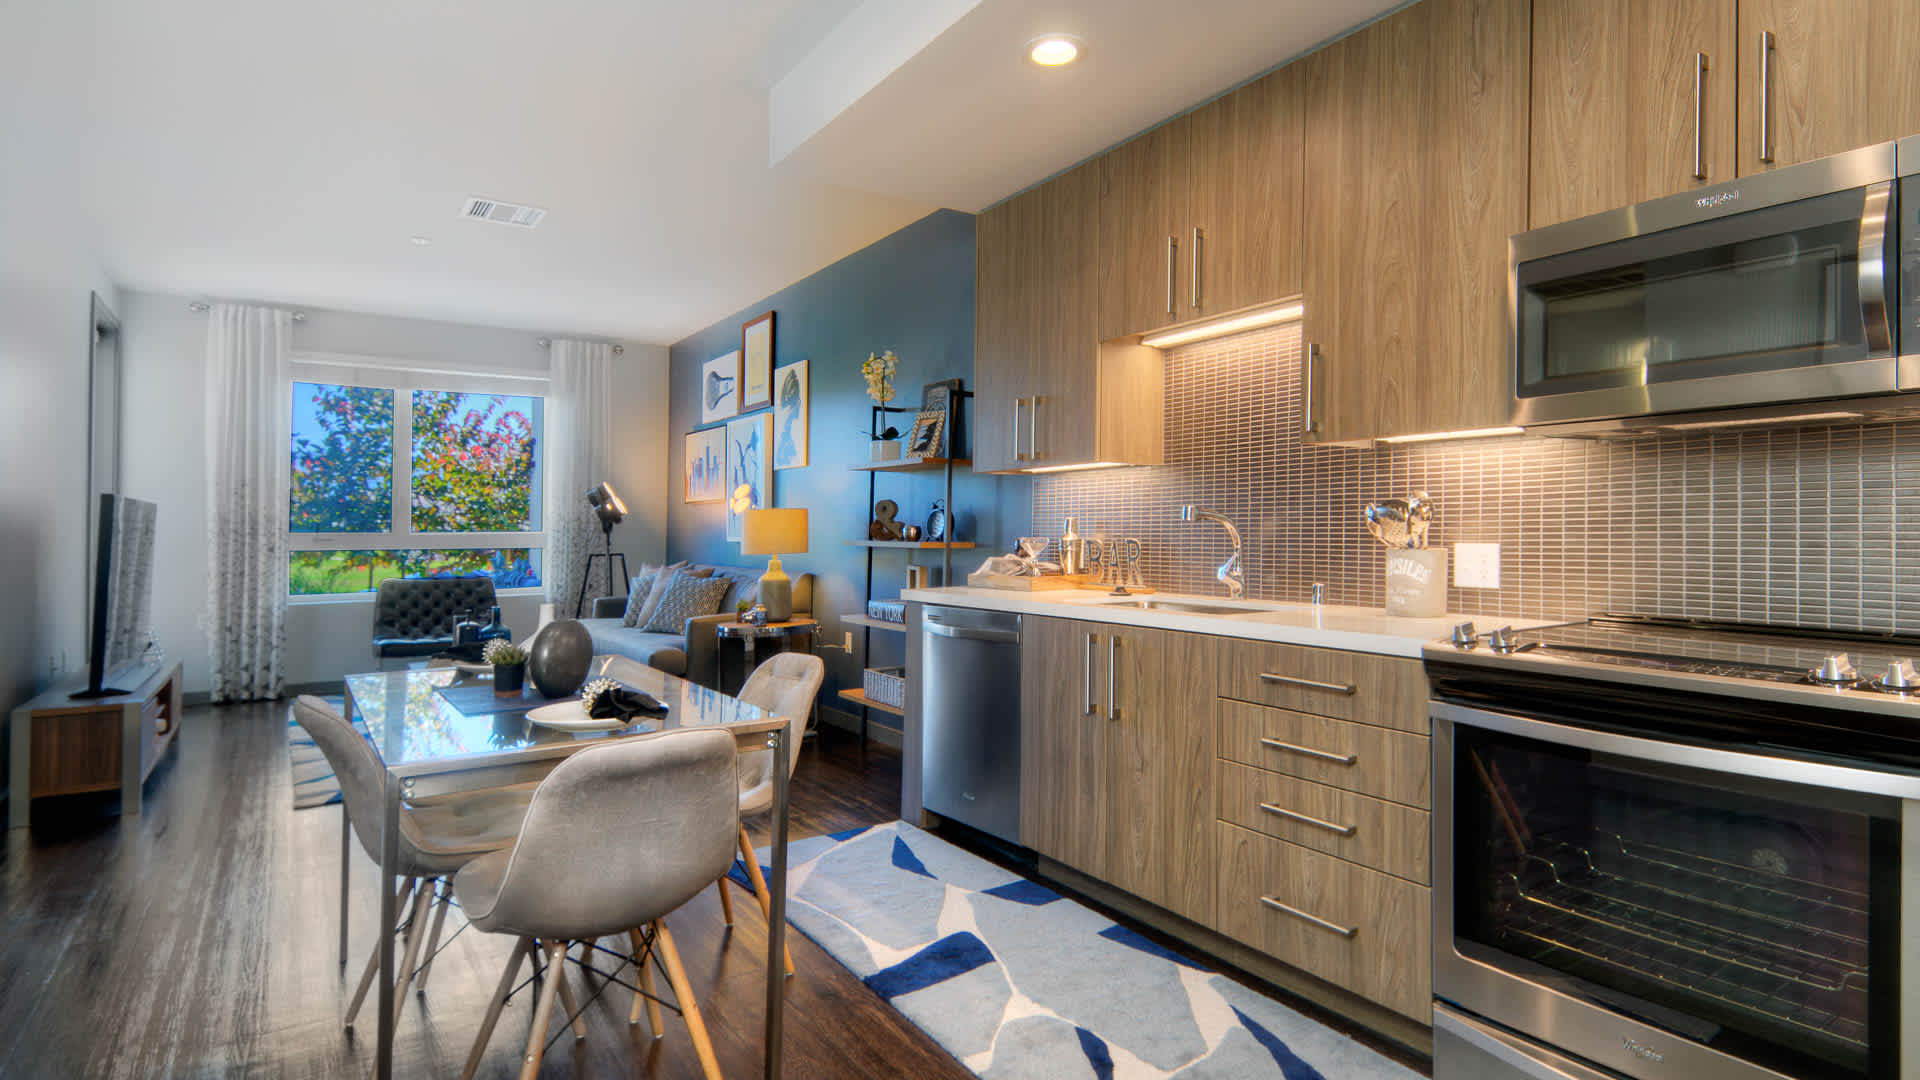 The Lex Corporate Apartment-Sample Image of San jose CA Insurance Housing